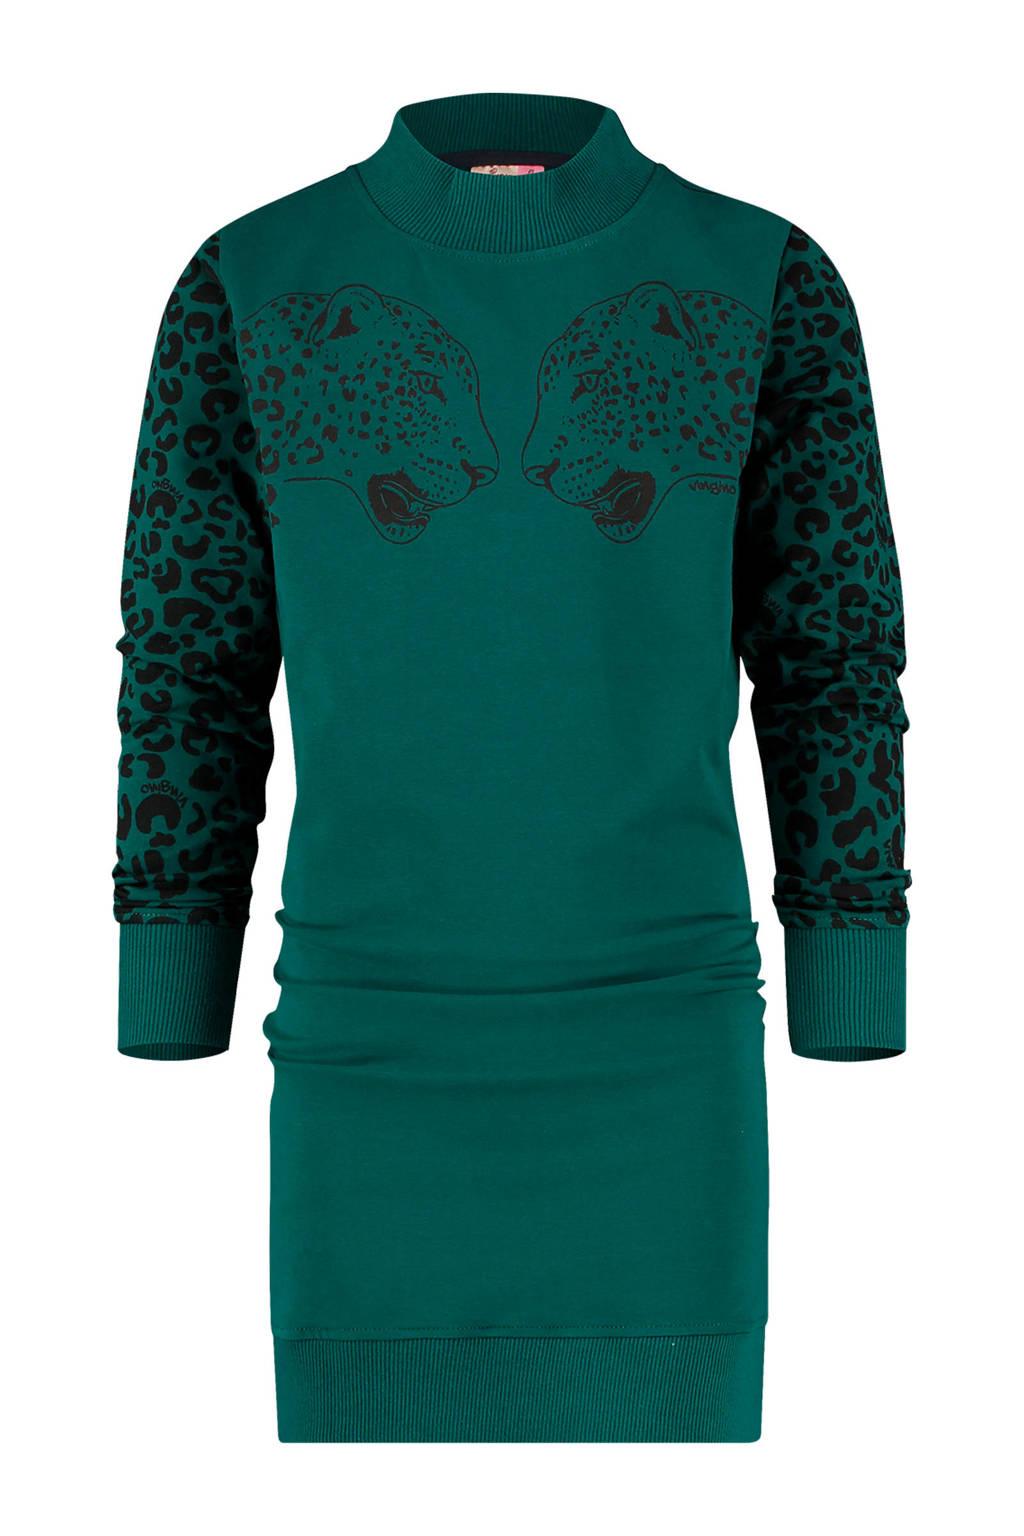 Vingino jersey jurk Palloes met printopdruk donkergroen, Donkergroen